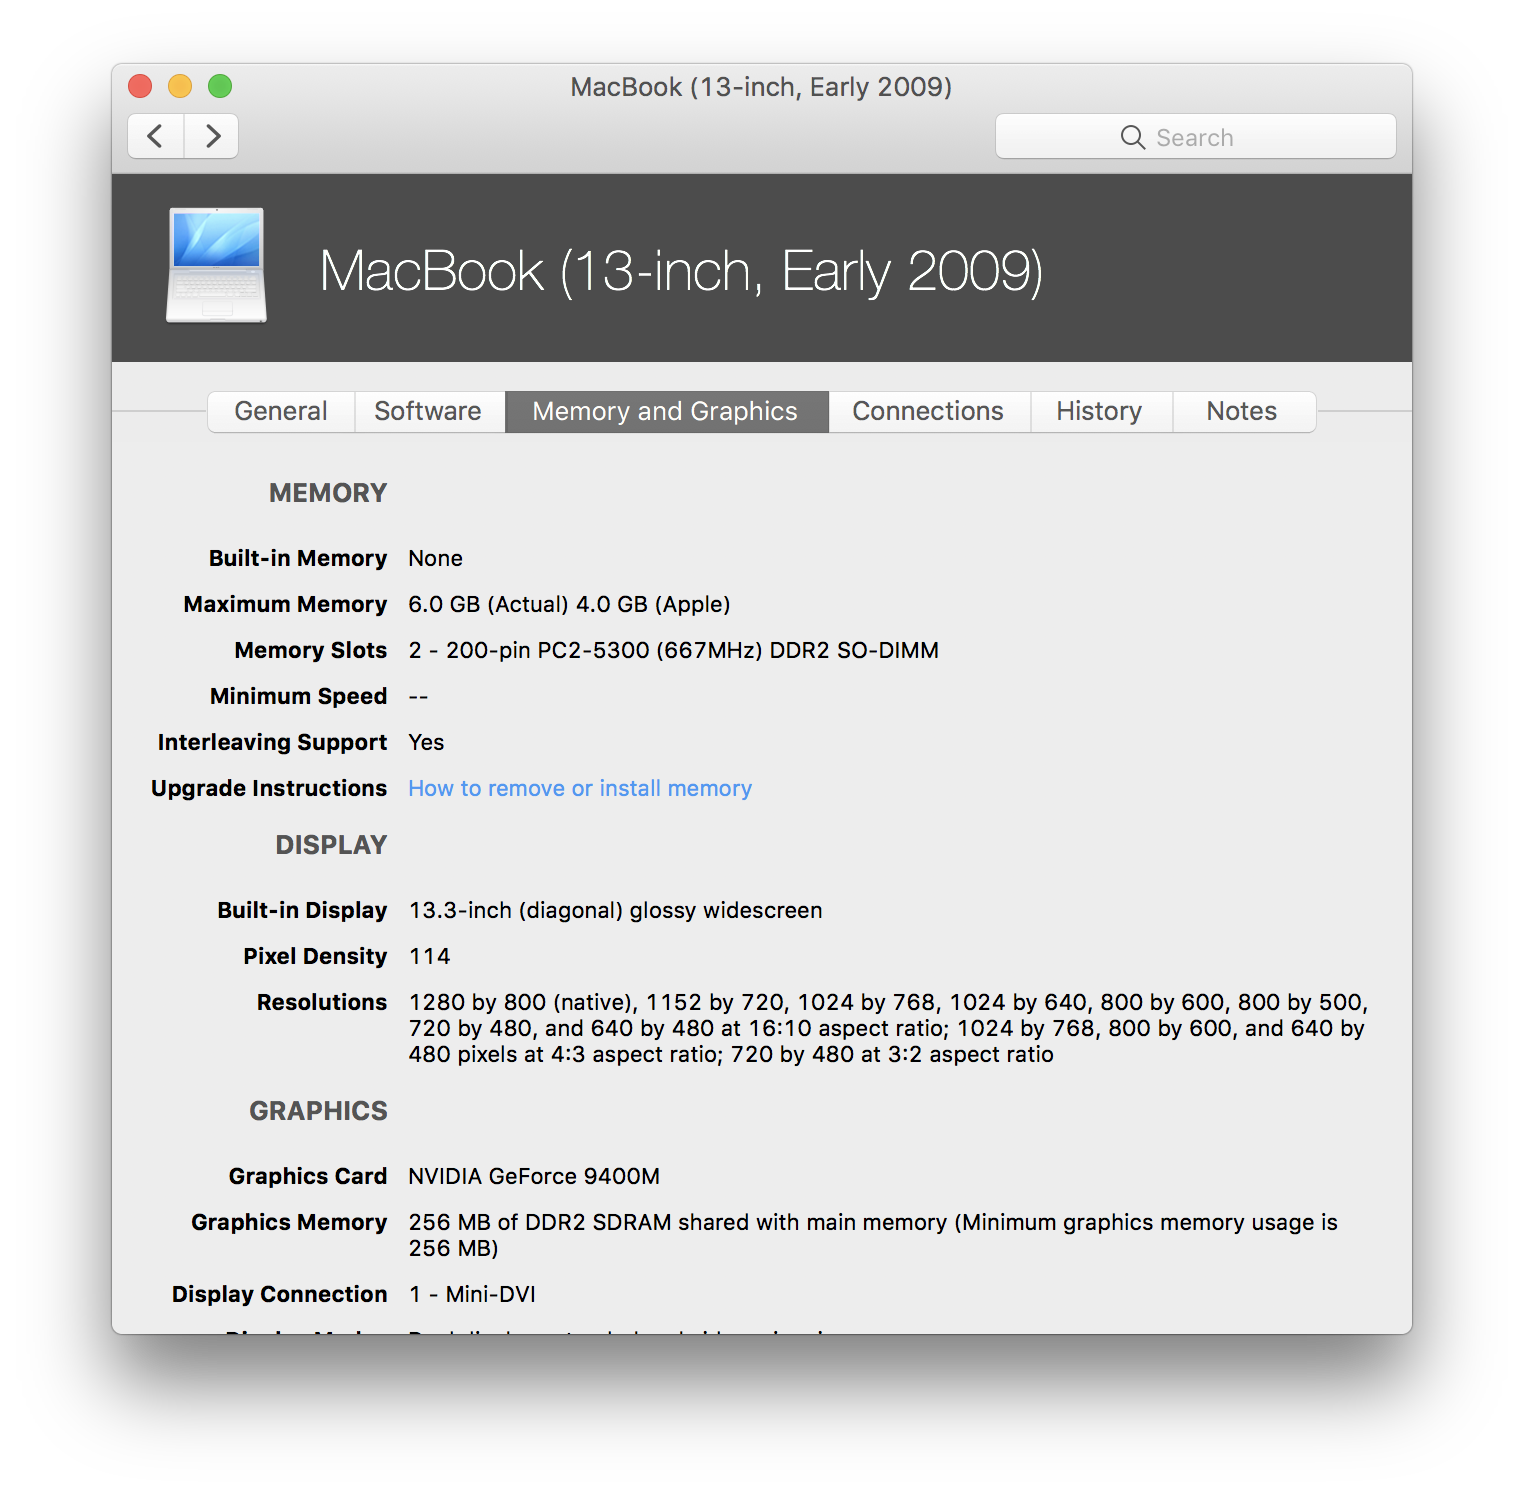 macbook-debut-2009.png